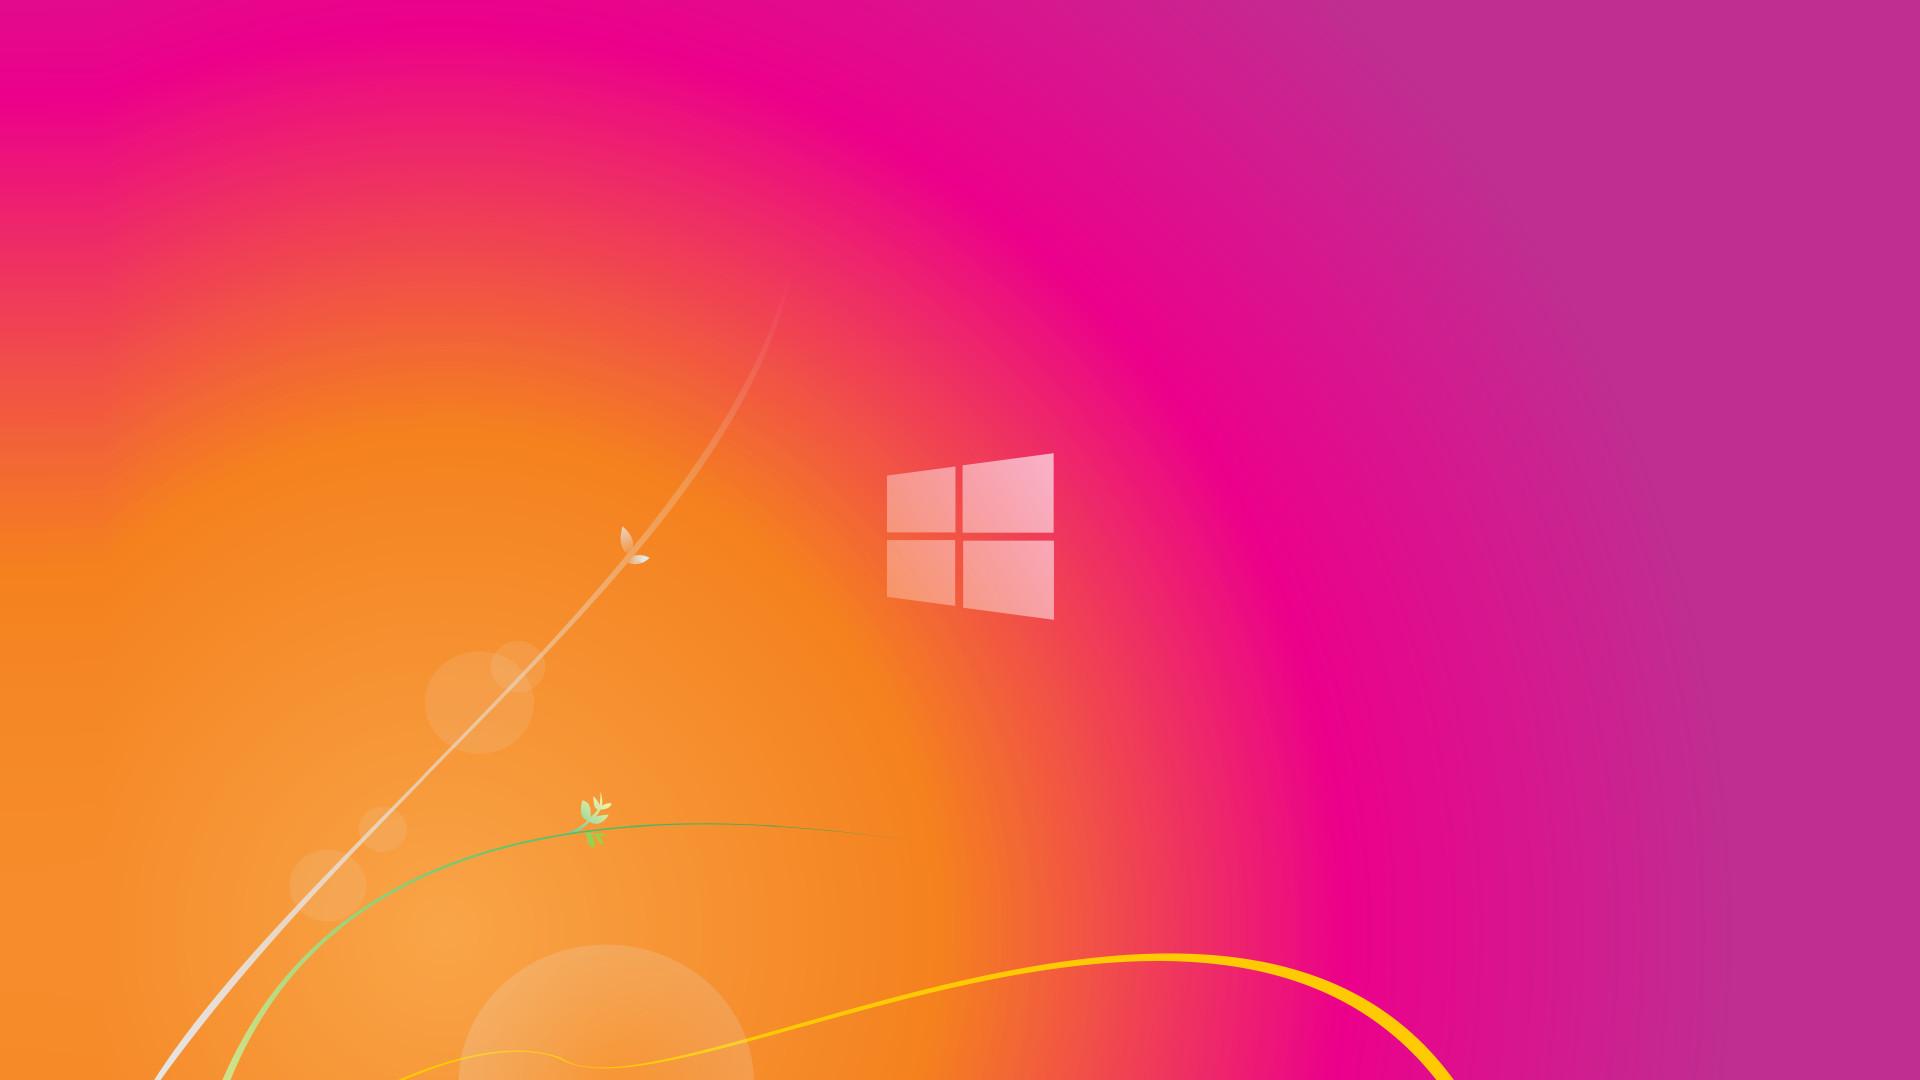 1920x1080 Windows 10 Lock Screen Dump